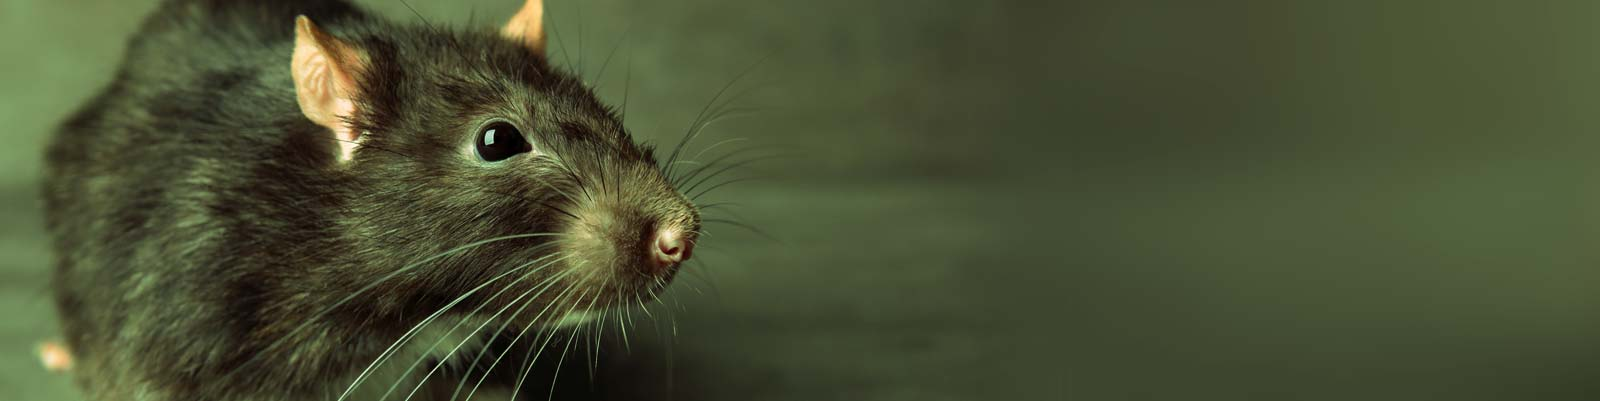 Rats Can Chew Through Plastic Airbricks